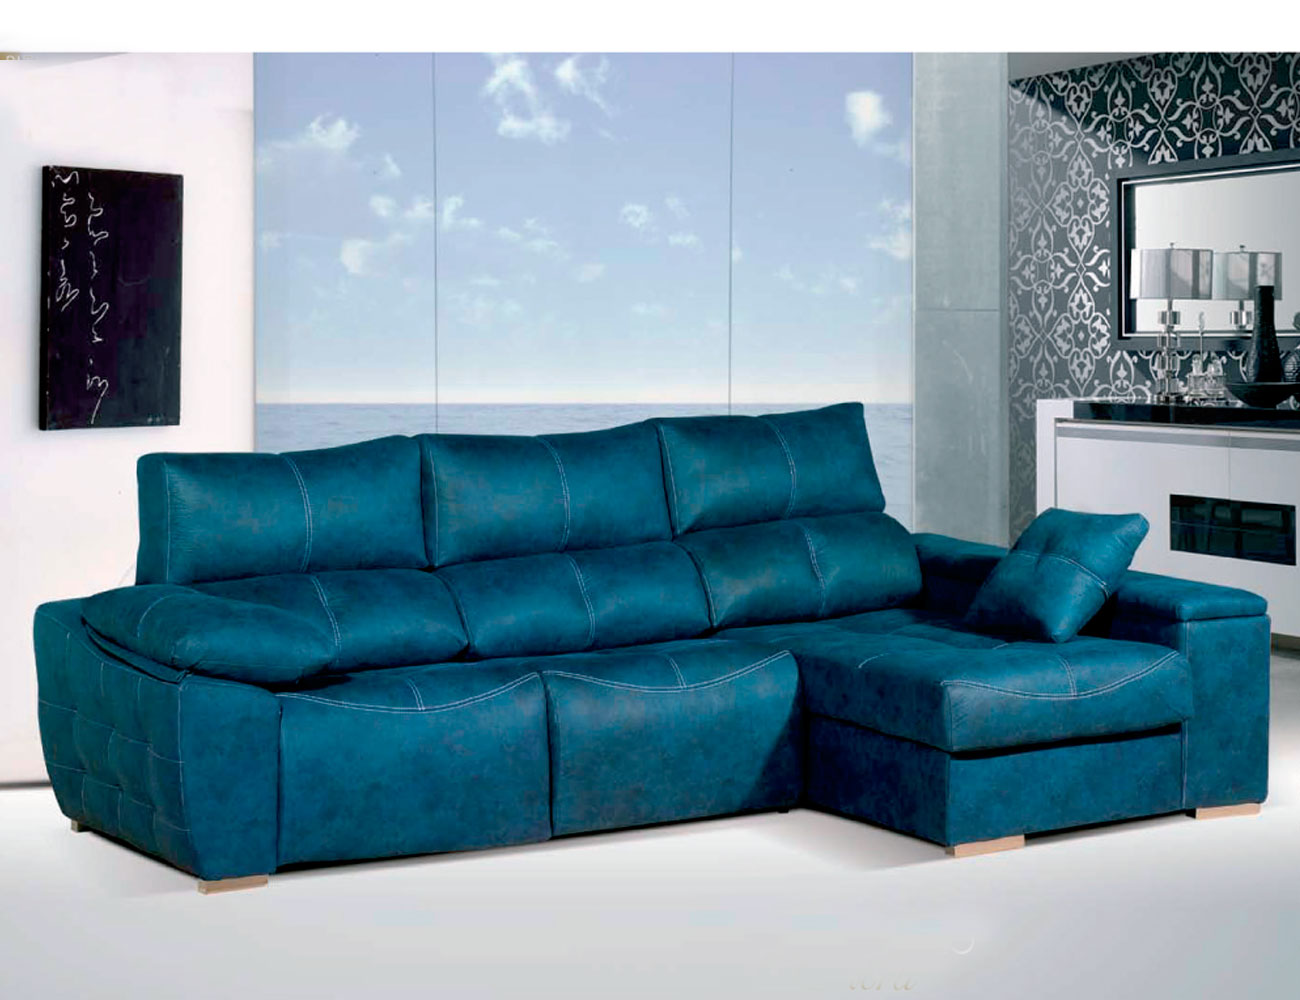 Sofa chaiselongue relax 2 motores anti manchas turquesa46